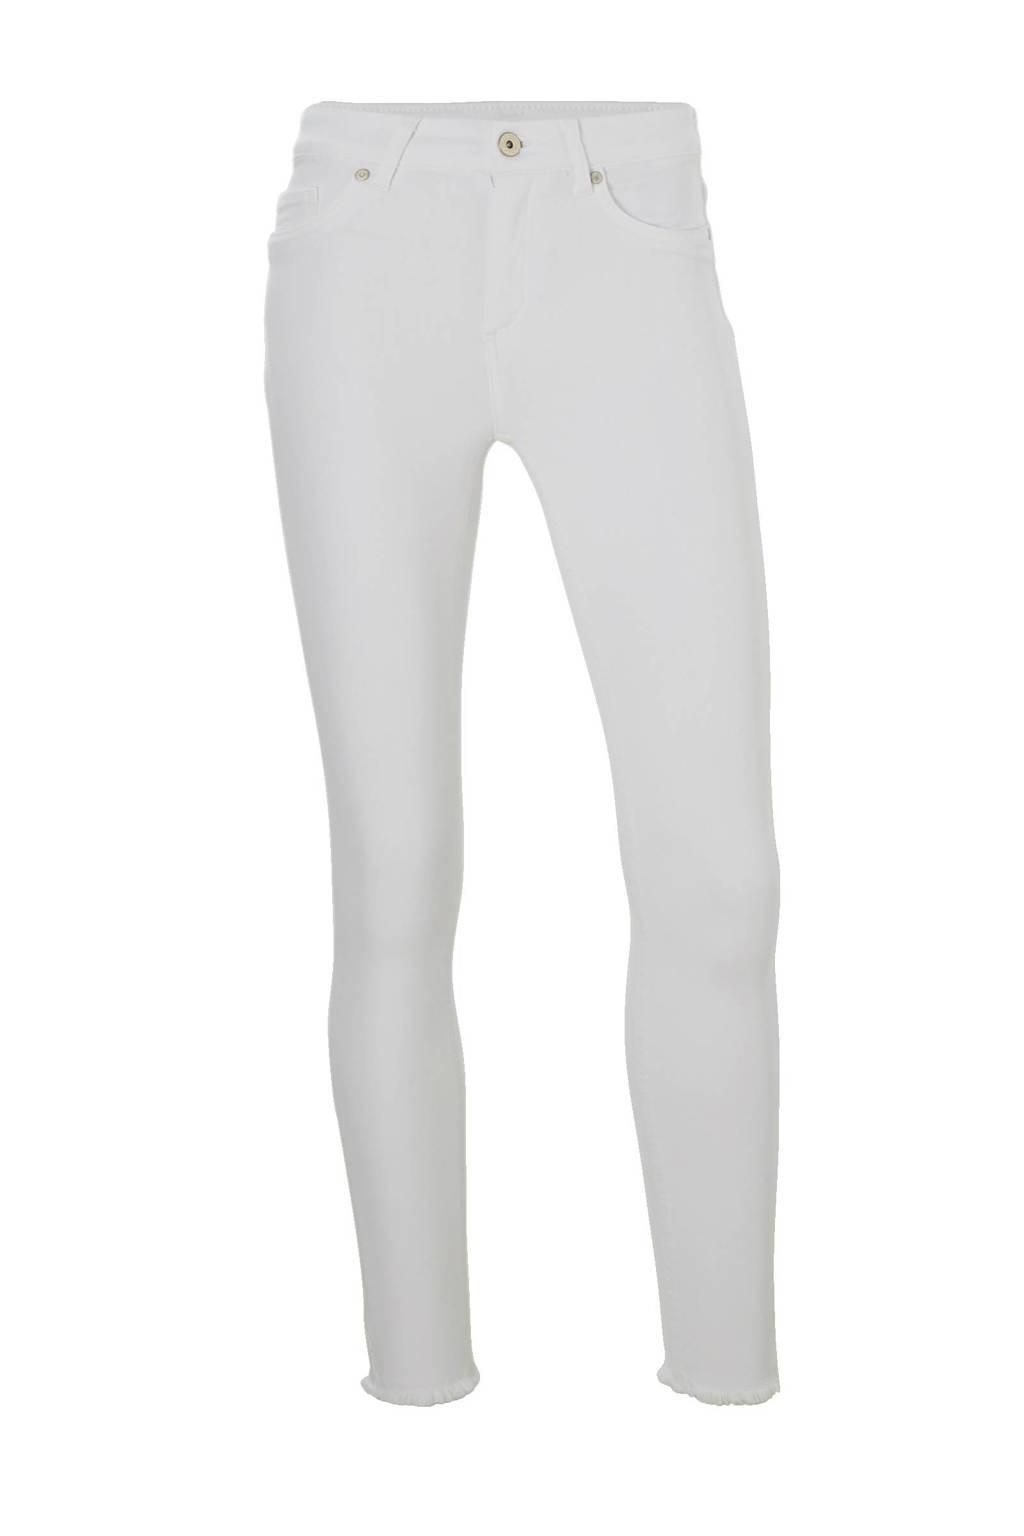 ONLY jeans met gerafelde zoom, Wit